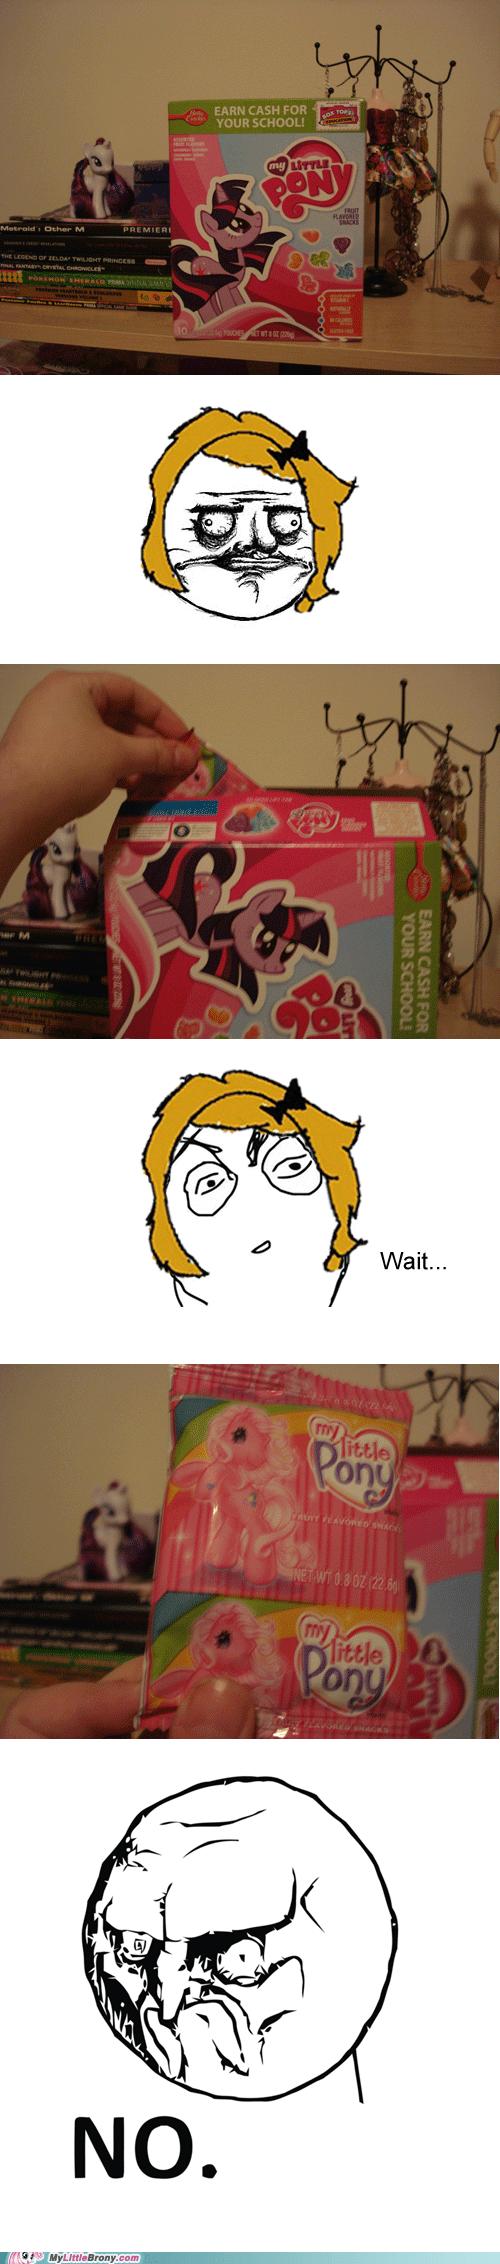 comic comics gen 5 my little pony no rage - 5703752192